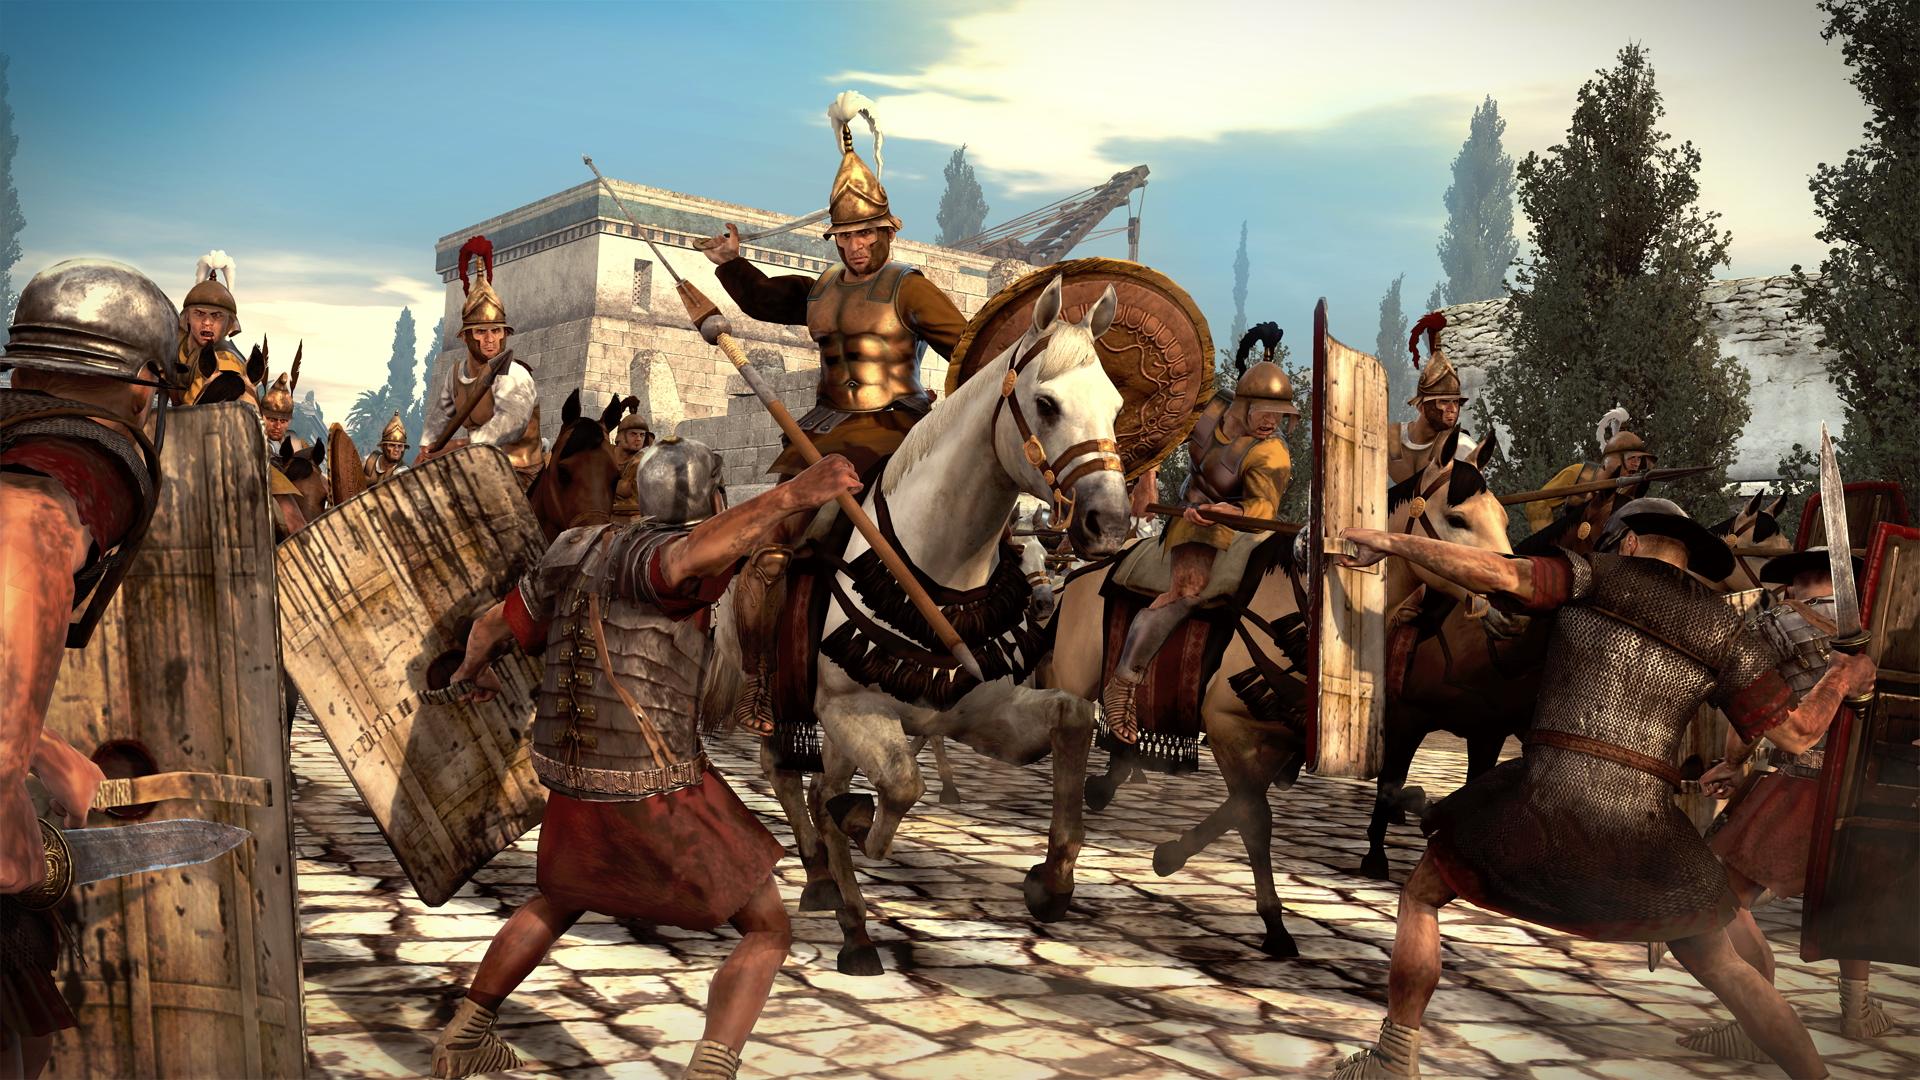 Rome ii total war naked skins nude image